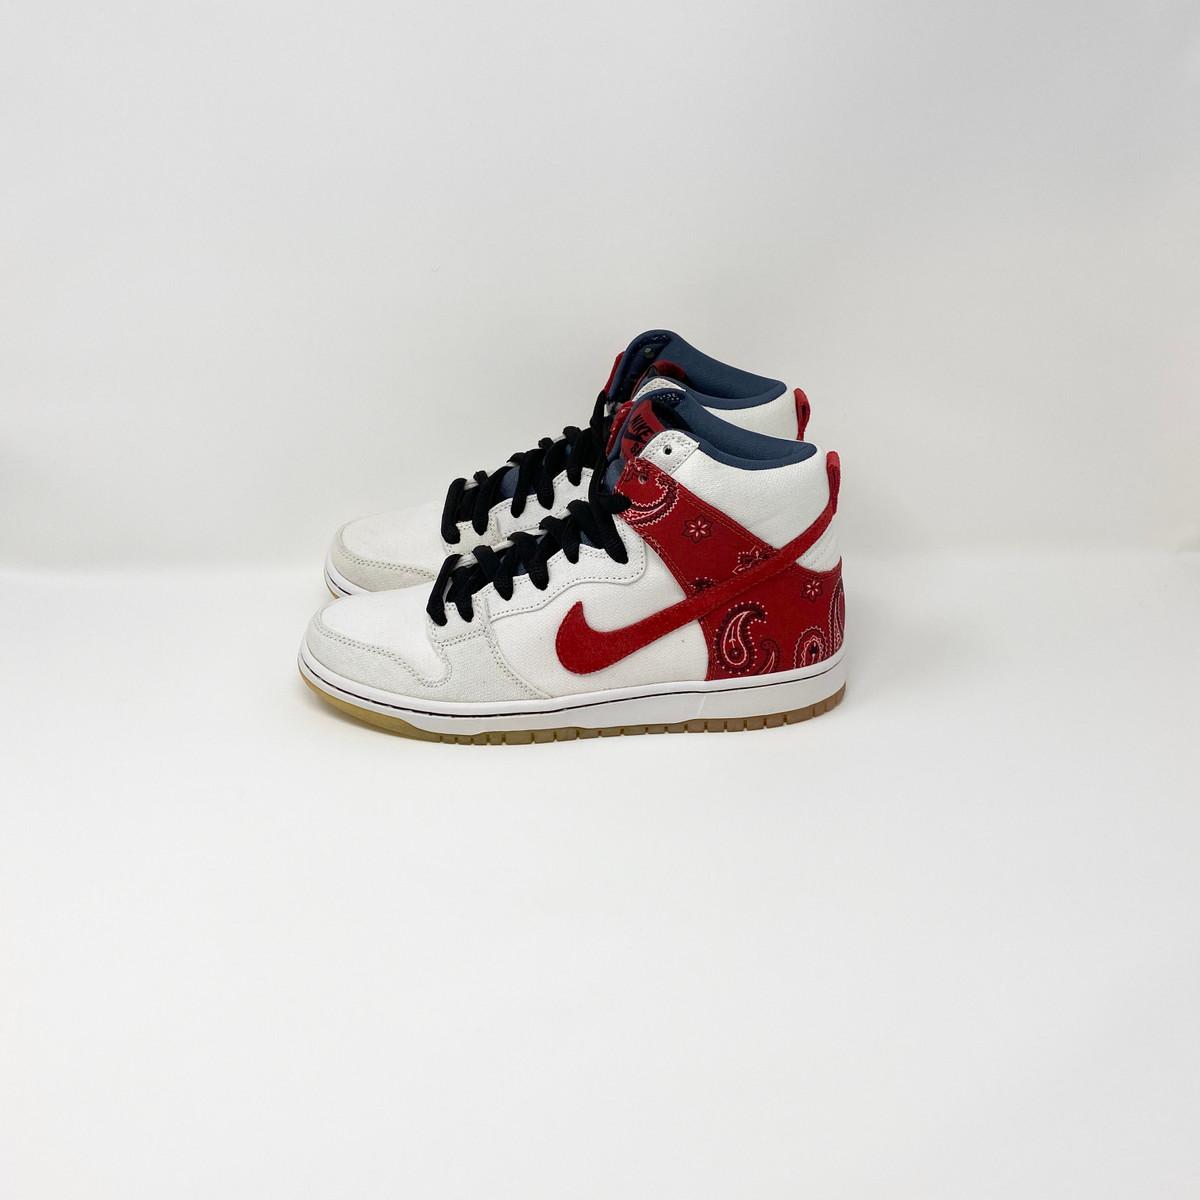 Nike Dunk Hi Pro SB Cheech and Chong